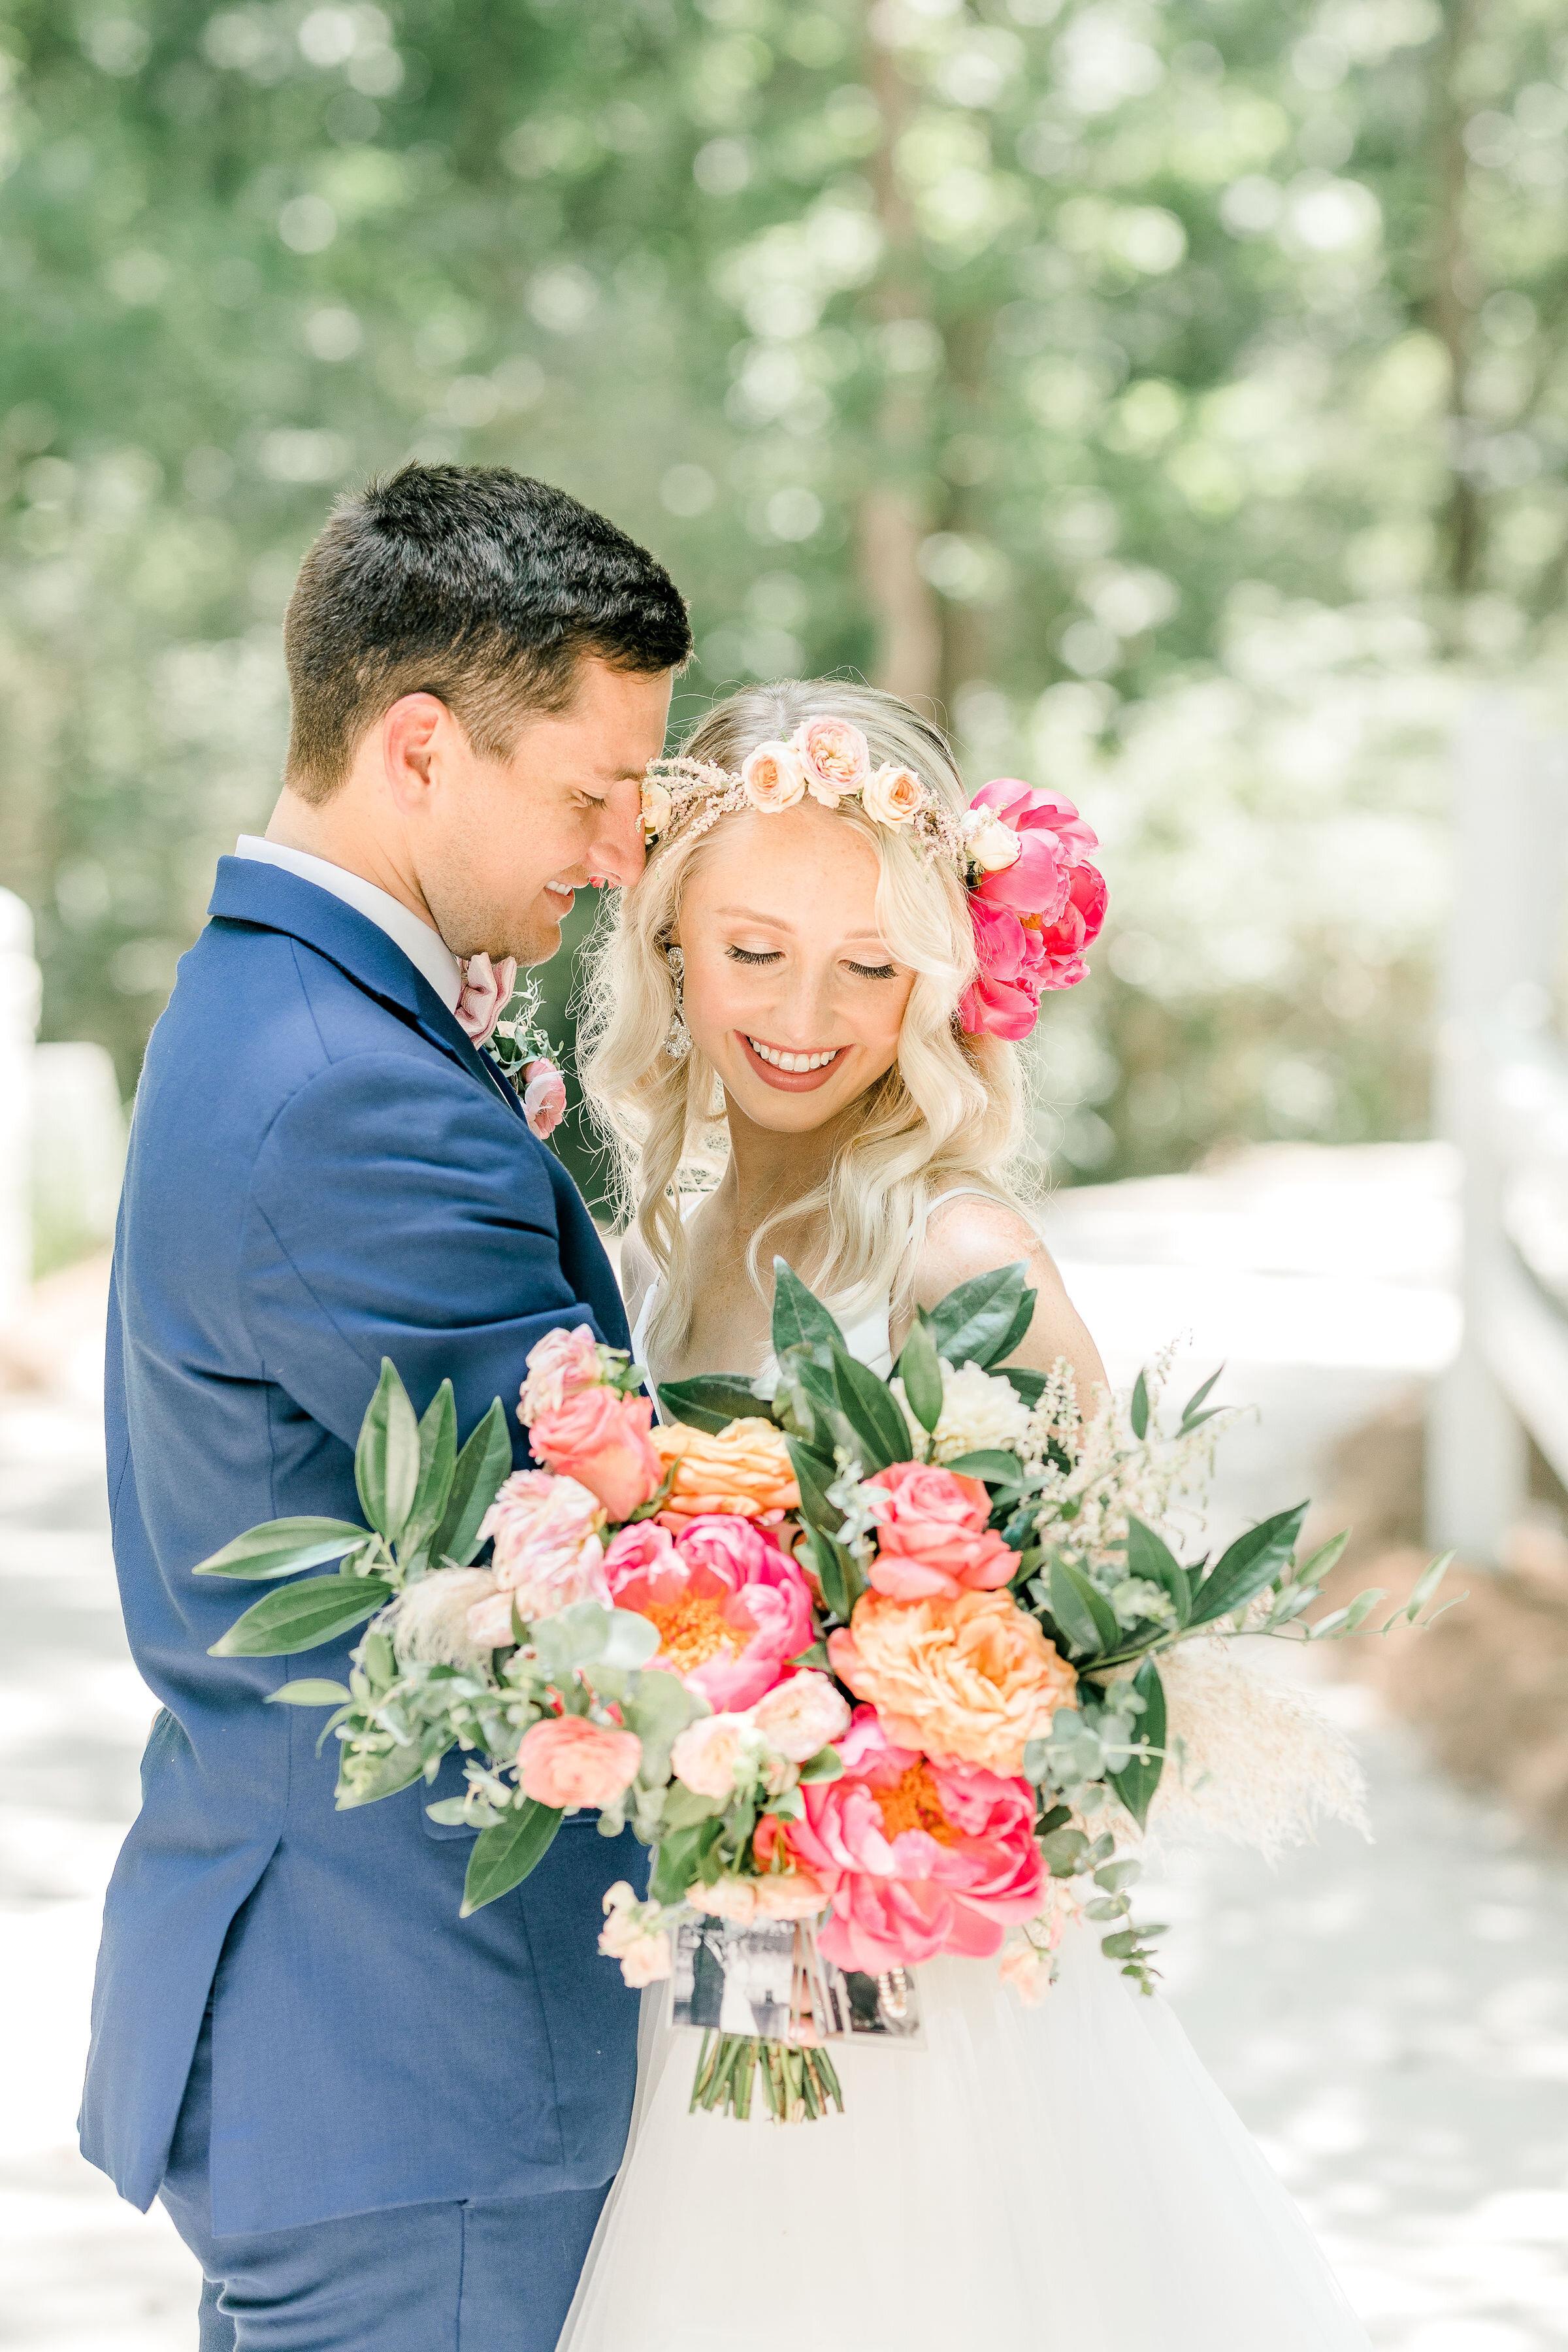 southern-couple-colorful-wedding-bright-flowers-pink-flowers-pink-and-green-flowers-flower-crown-mackey-house-wedding-couple.jpg